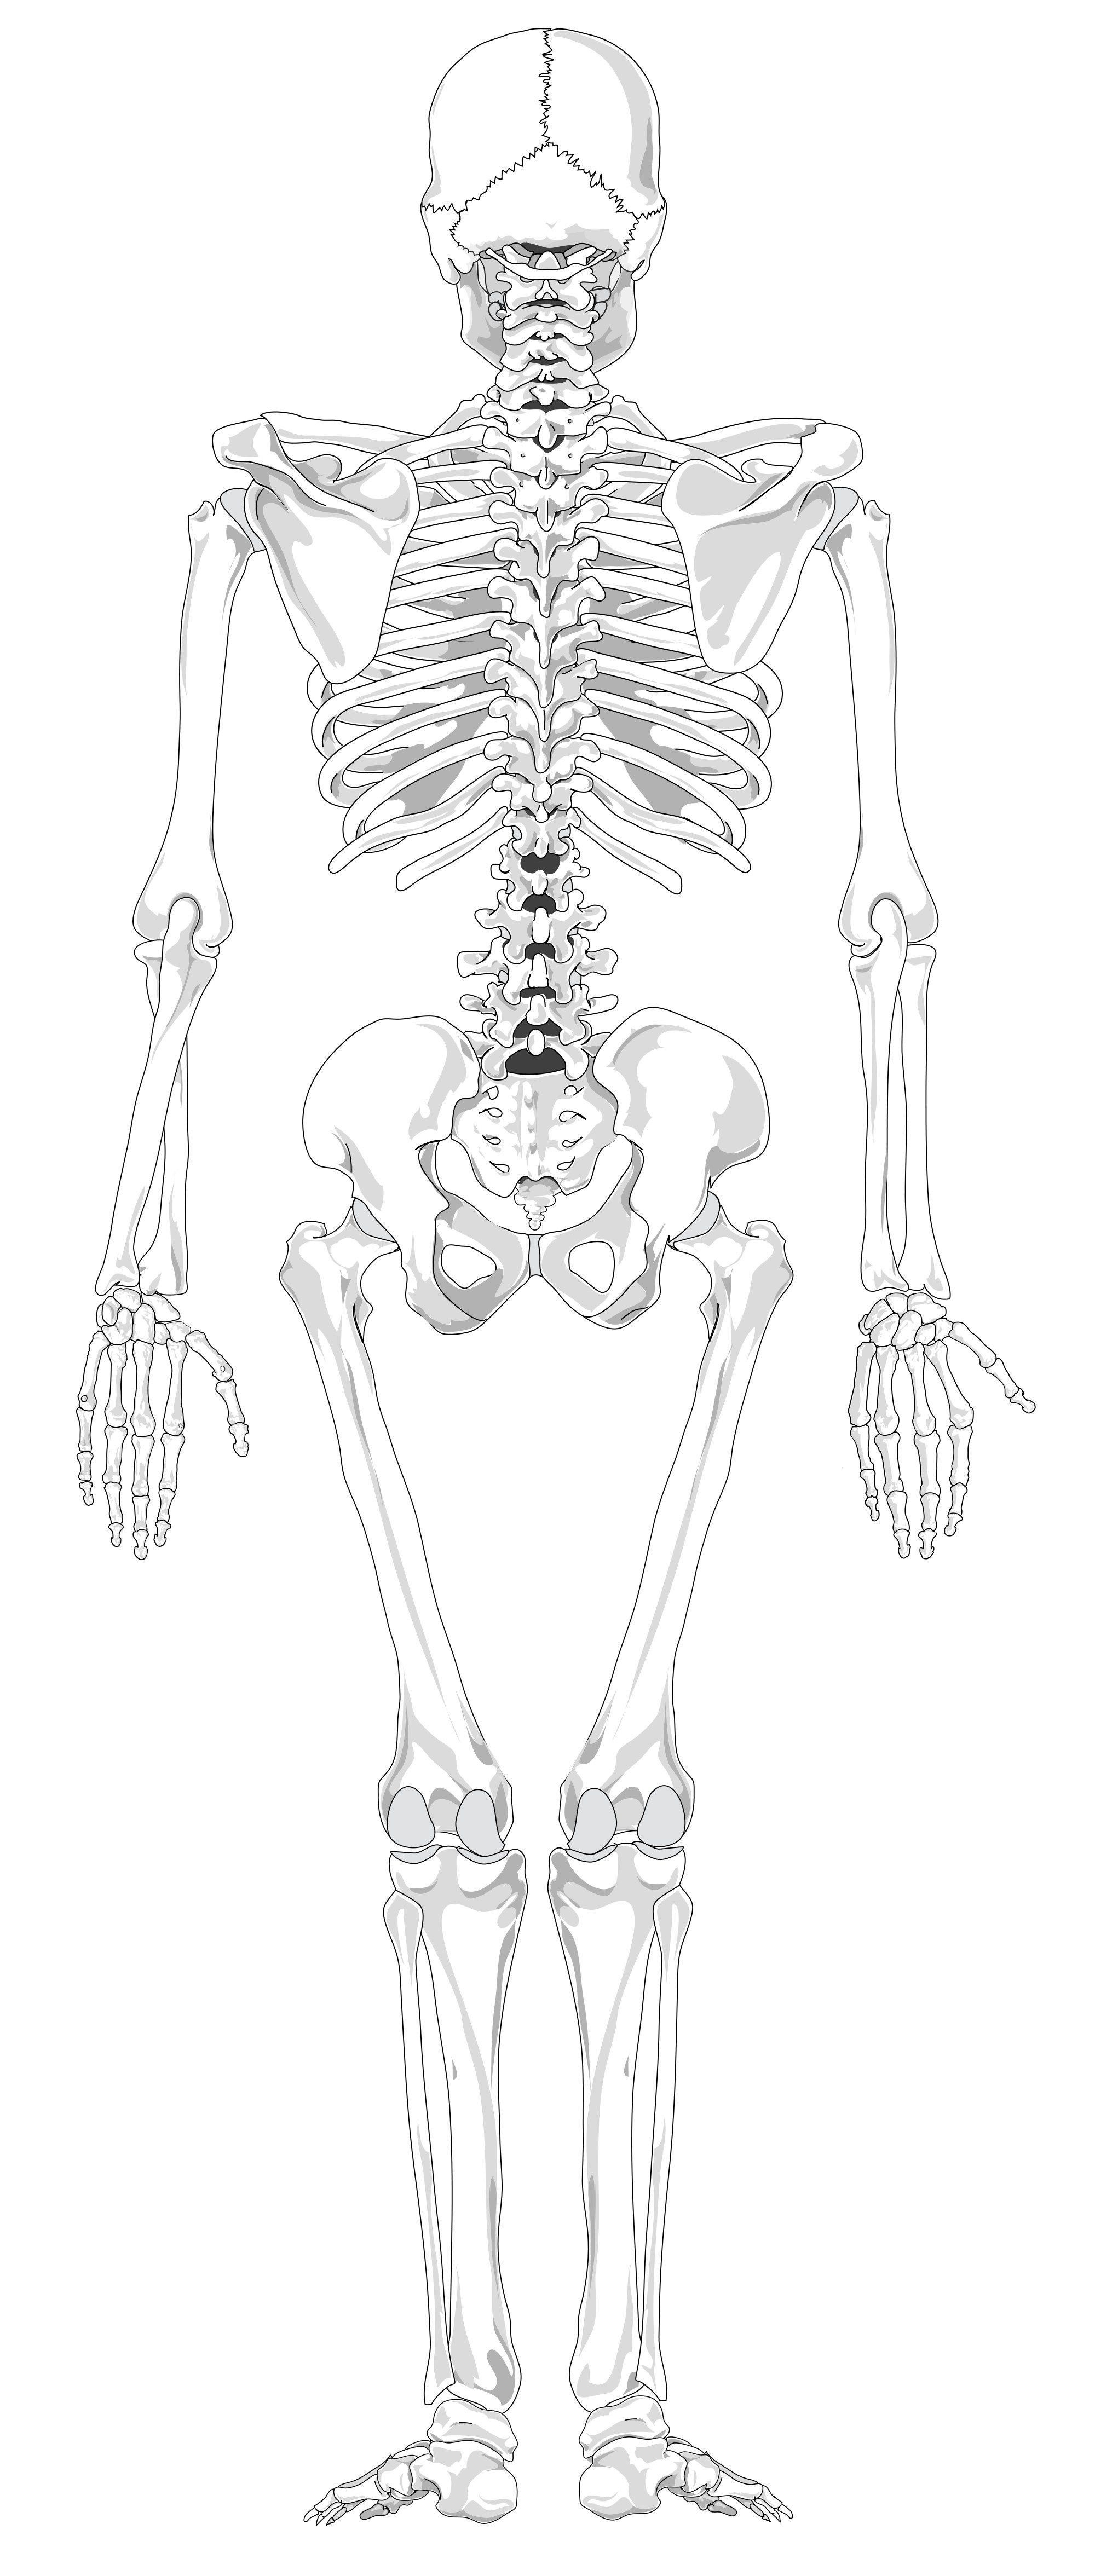 Human Skeleton Diagram Unlabeled Koibana Info Human Skeleton Skeleton Anatomy Skeleton Drawings